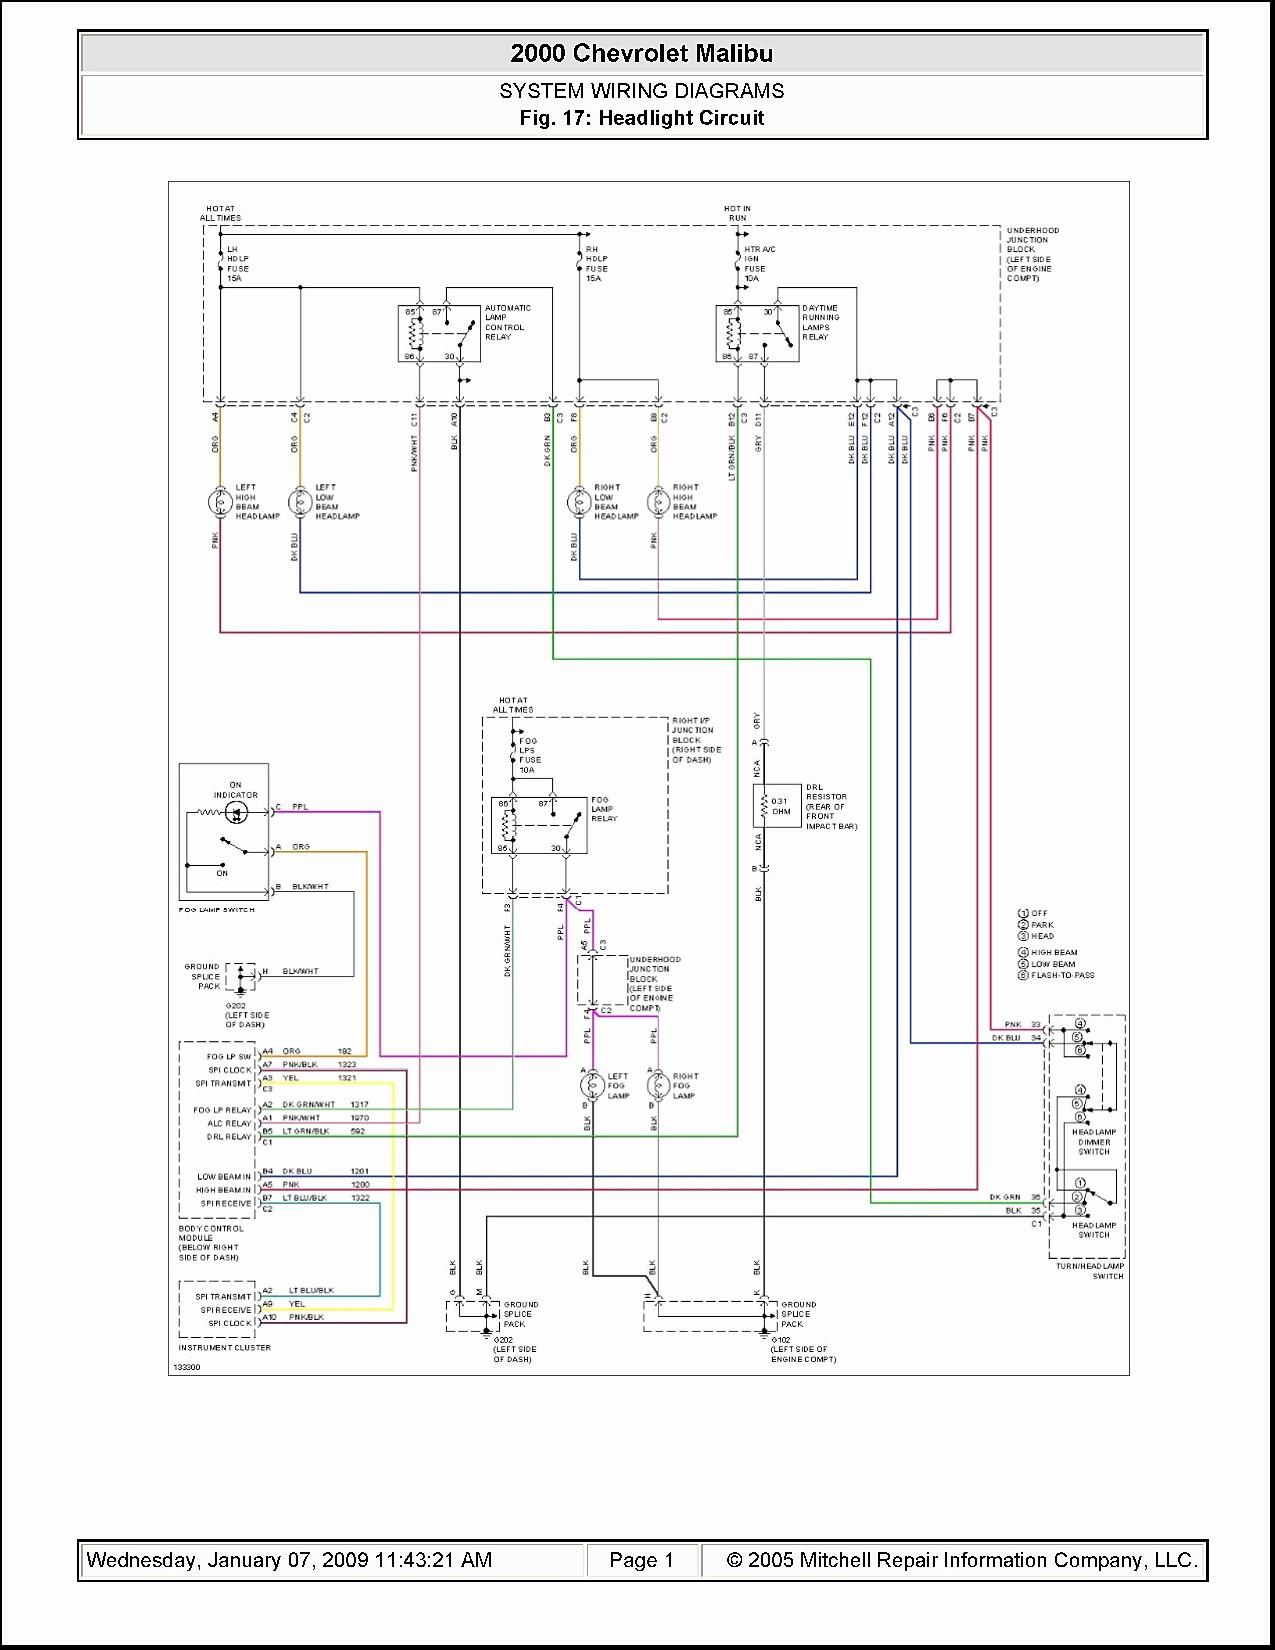 DOWNLOAD DIAGRAM 2002 Kia Sedona Instrument Cluster Fuse Box Diagram  Amotmx HD Version - CLAMDIAGRAMS.BRUXELLES-ENSCENE.BE [ 1294 x 1000 Pixel ]